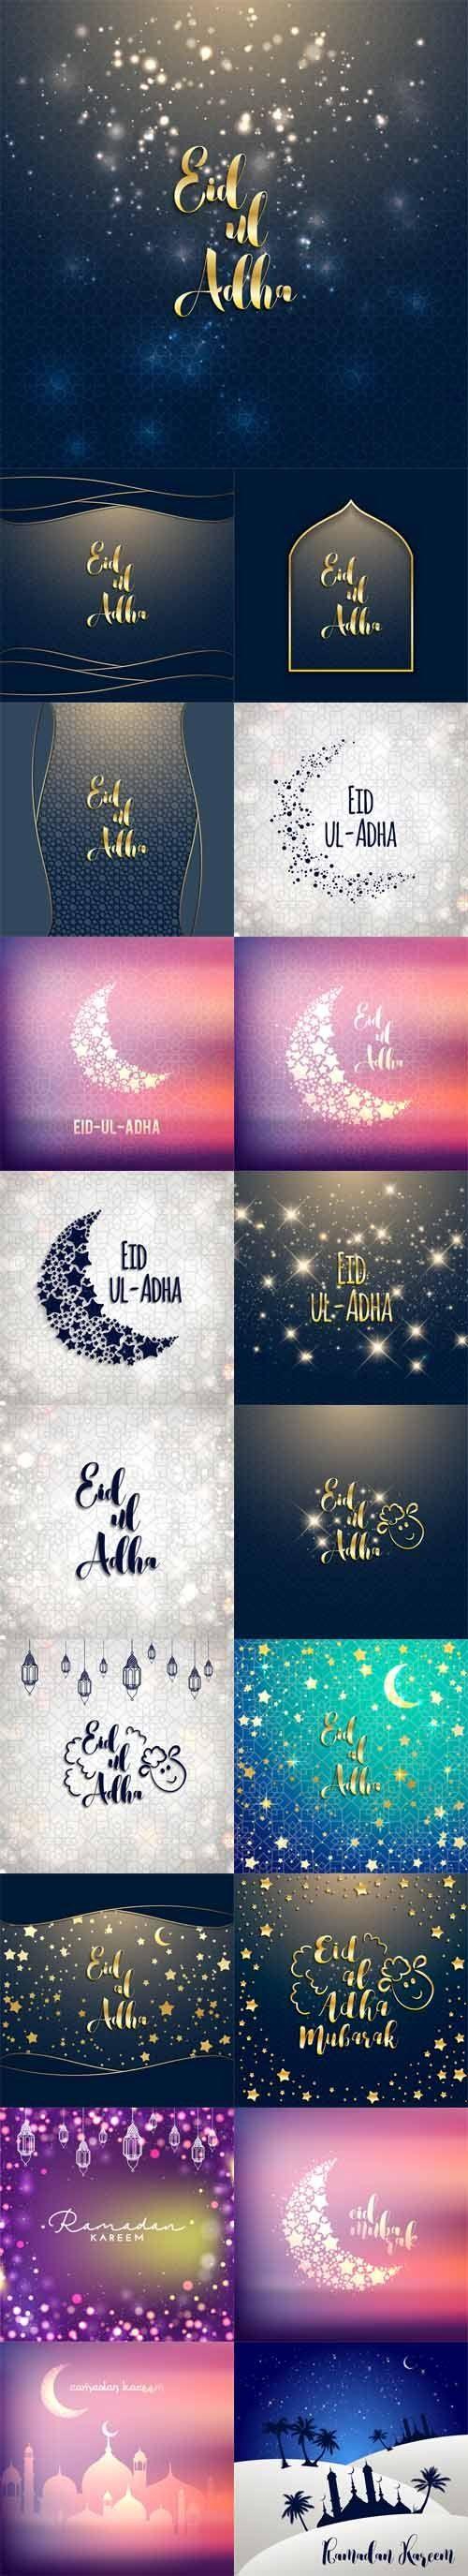 Vector Muslim community festival Eid al Adha Mubarak beautiful greeting card with stars Sacrifice Feast